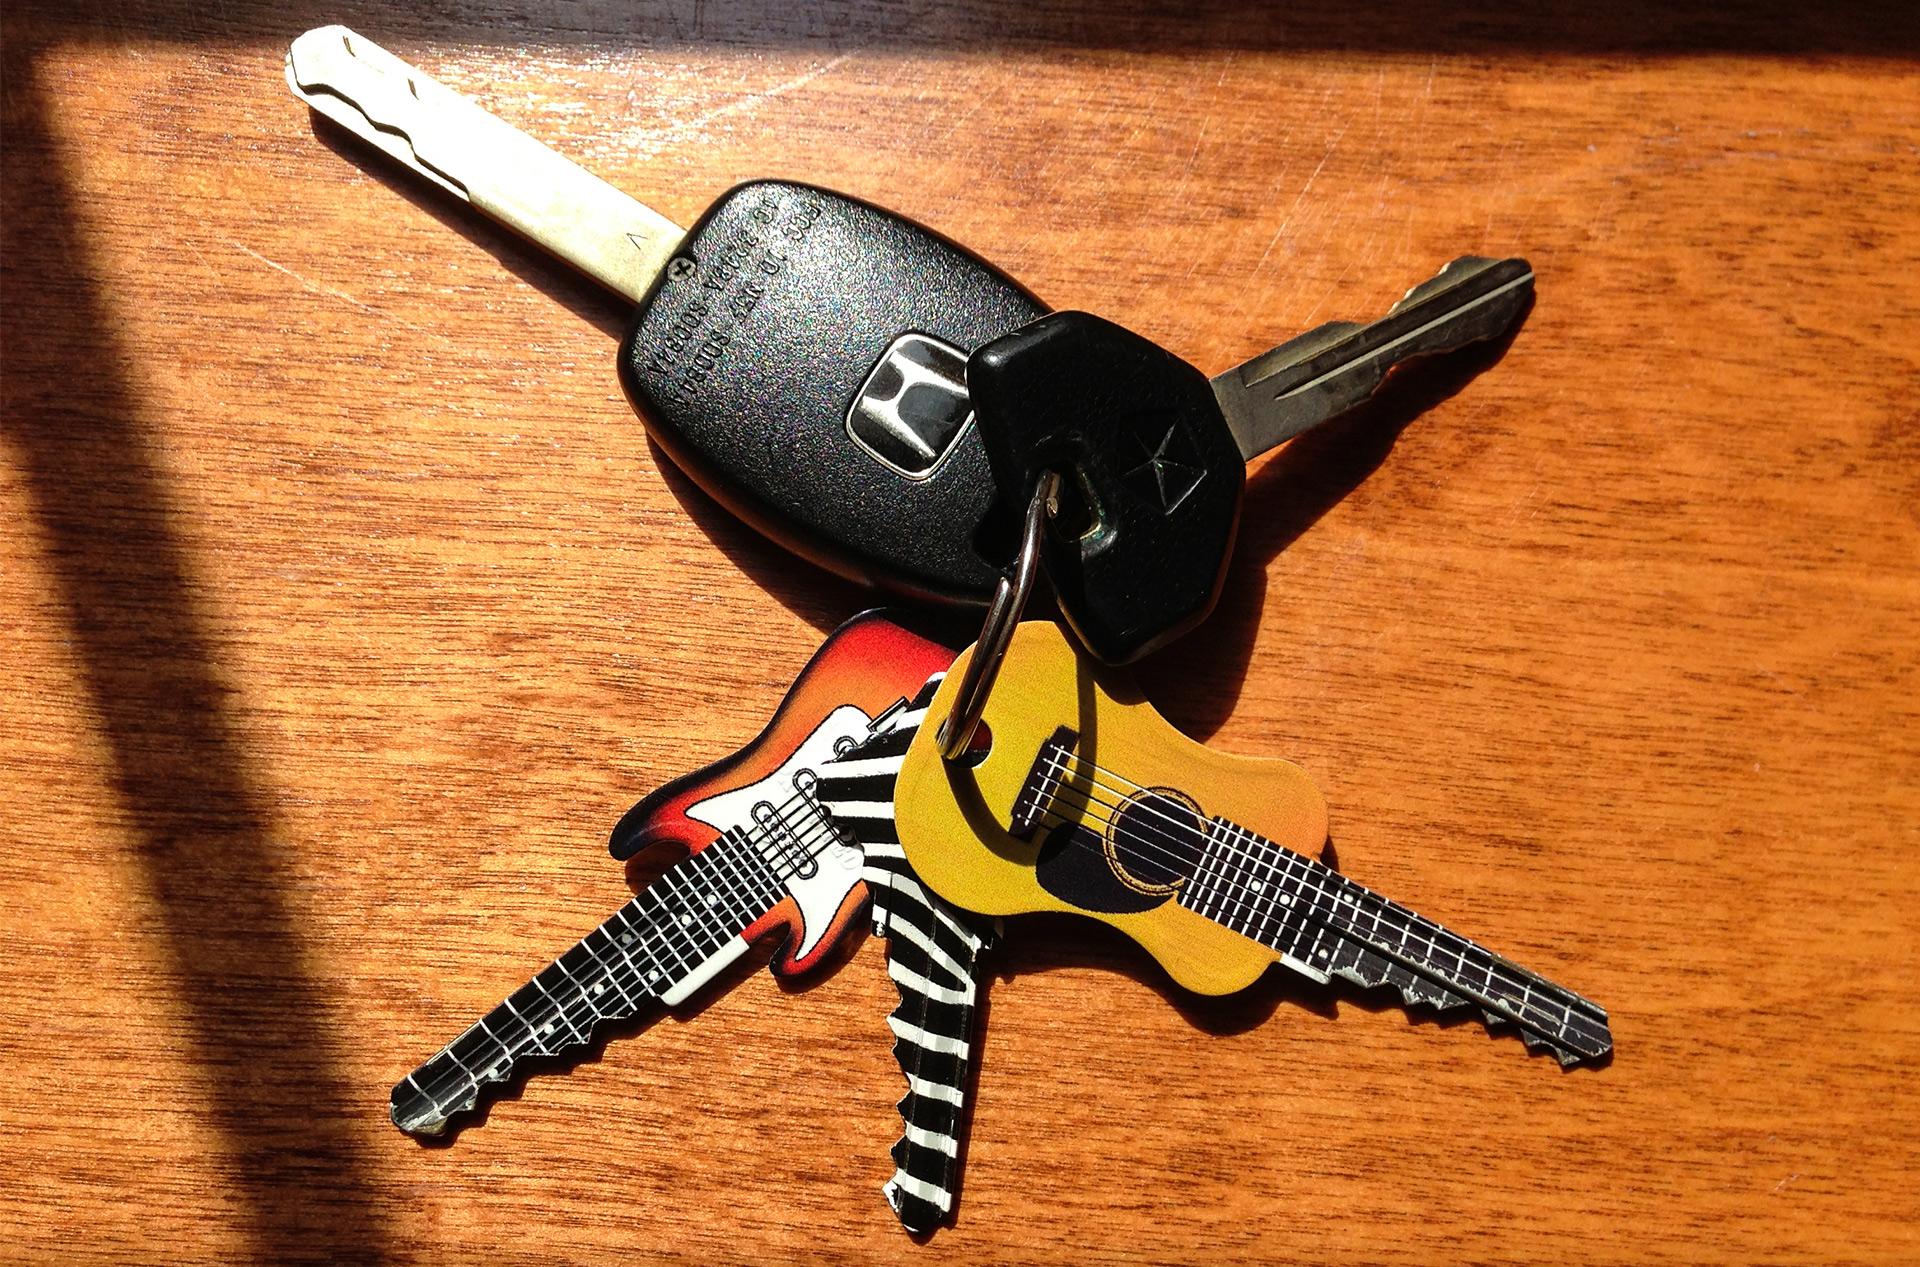 Rockin' Keys